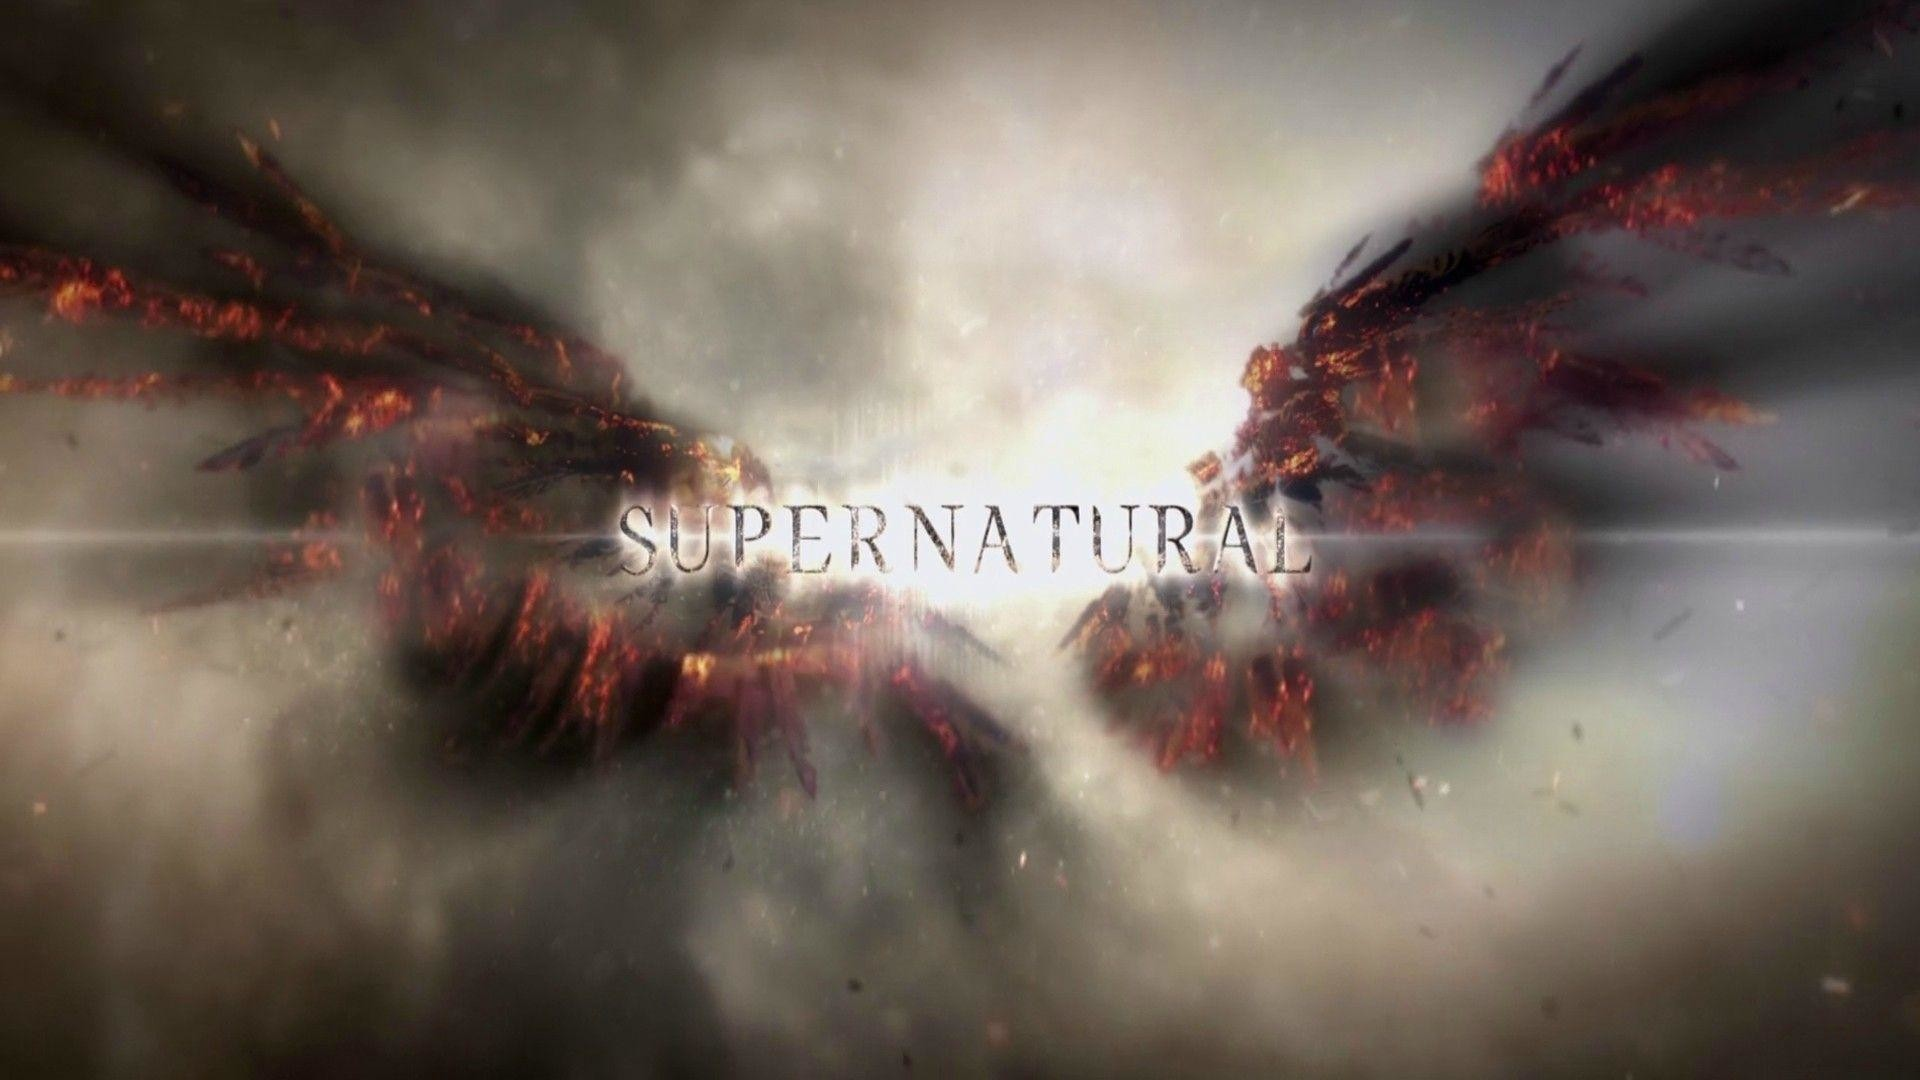 Supernatural Wallpaper 81 Pictures